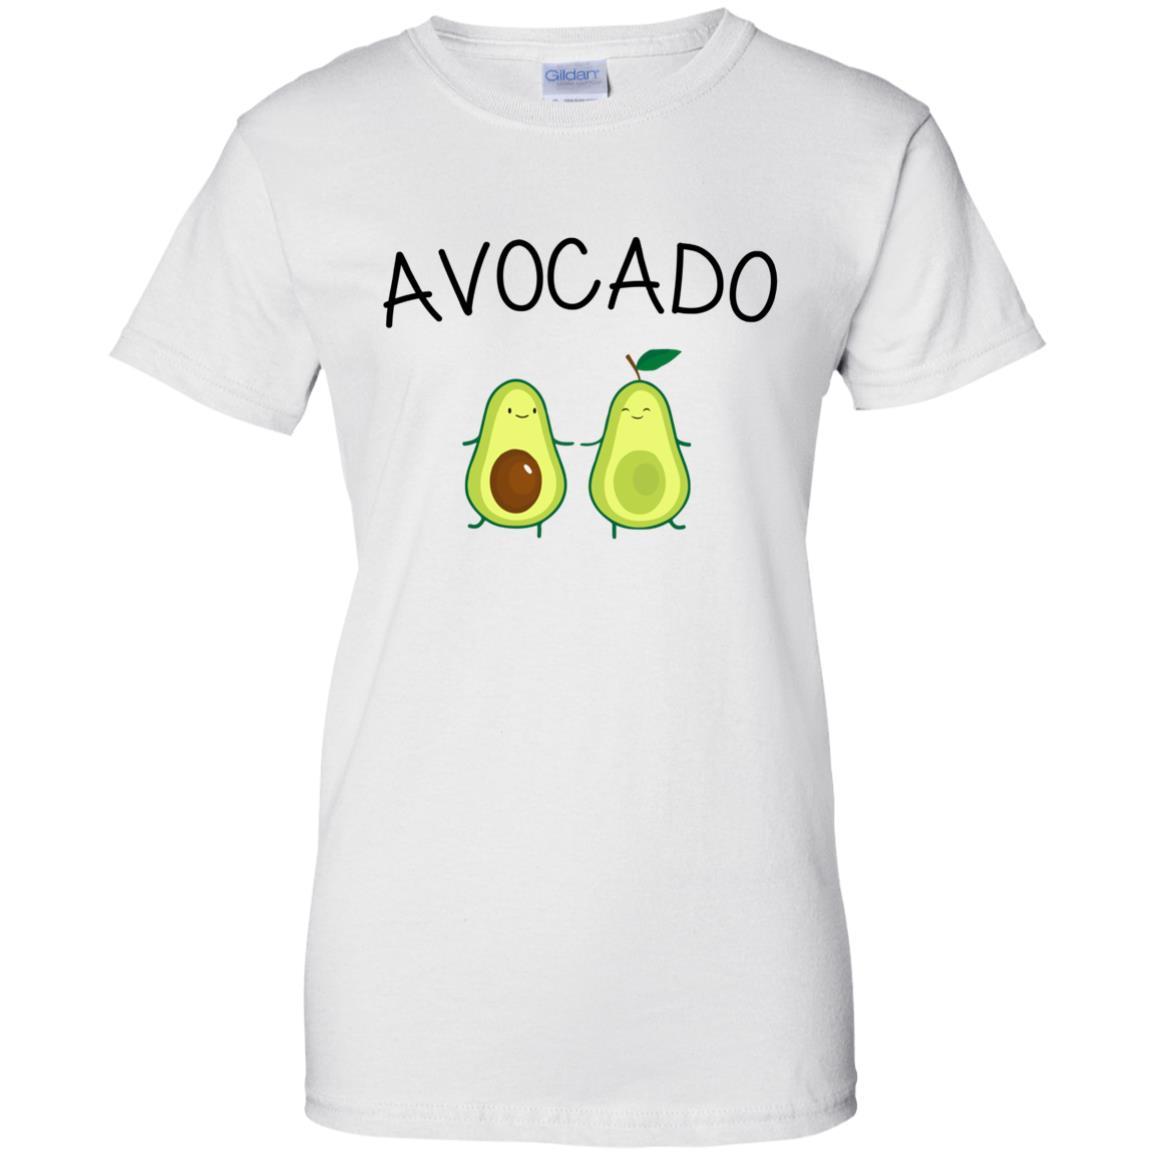 image 24 - Vegan Avocado Shirt, Sweater, Hoodie